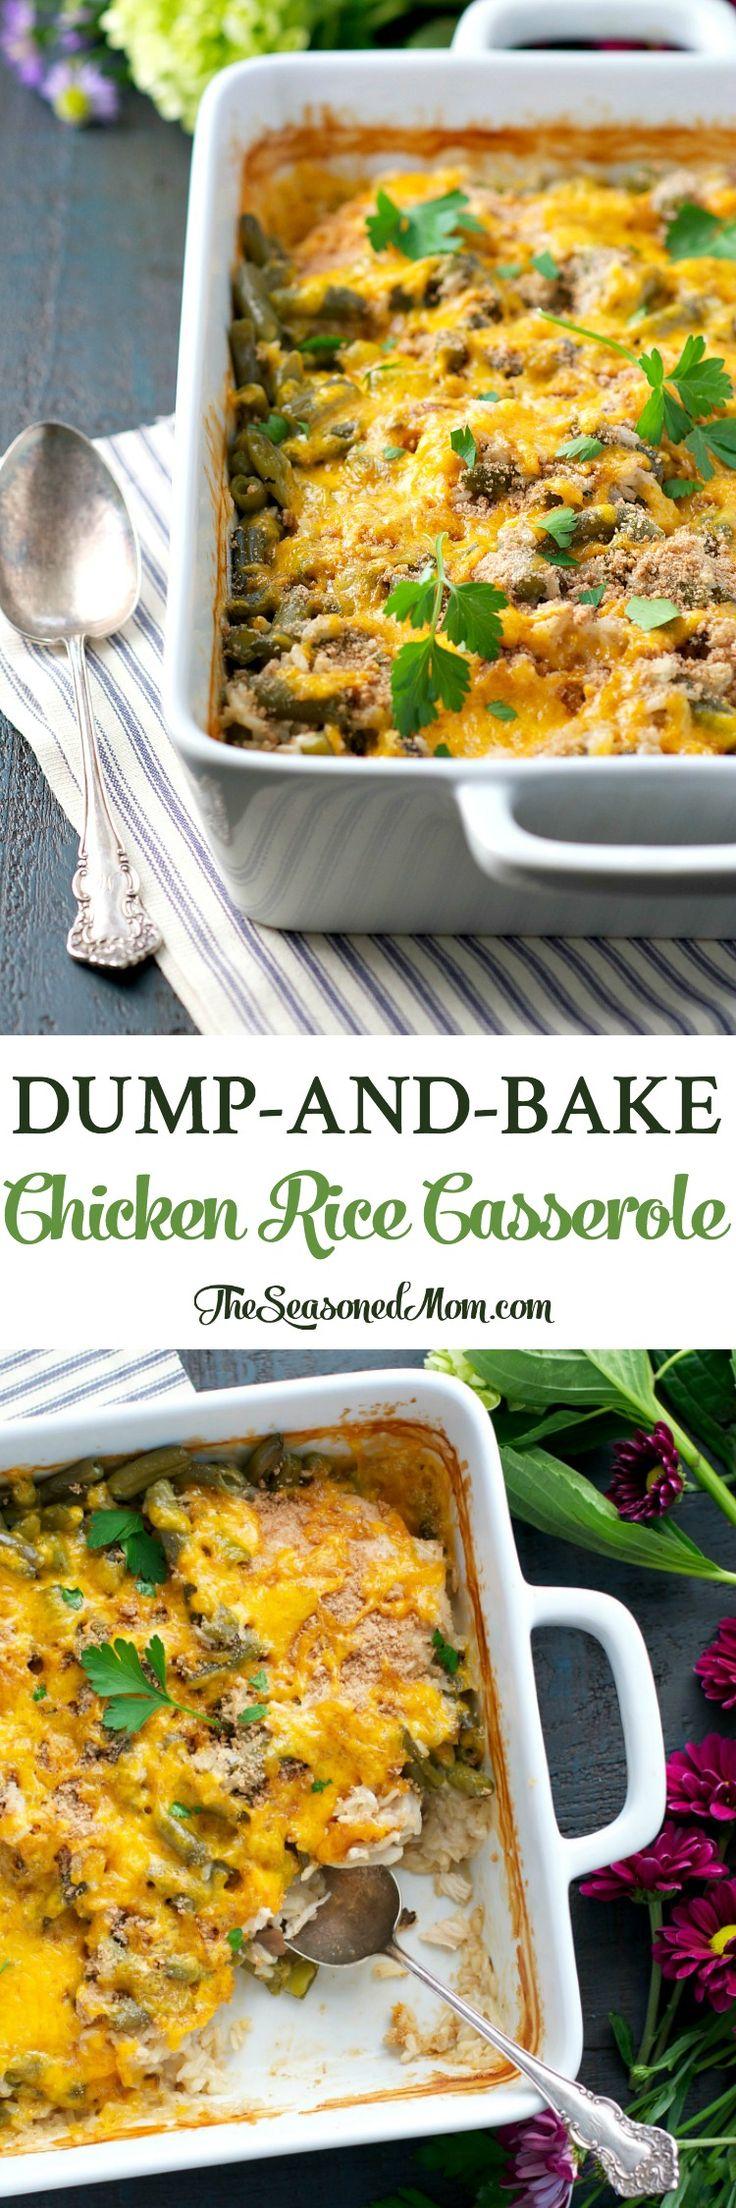 Dumpandbake Chicken Rice Casserole